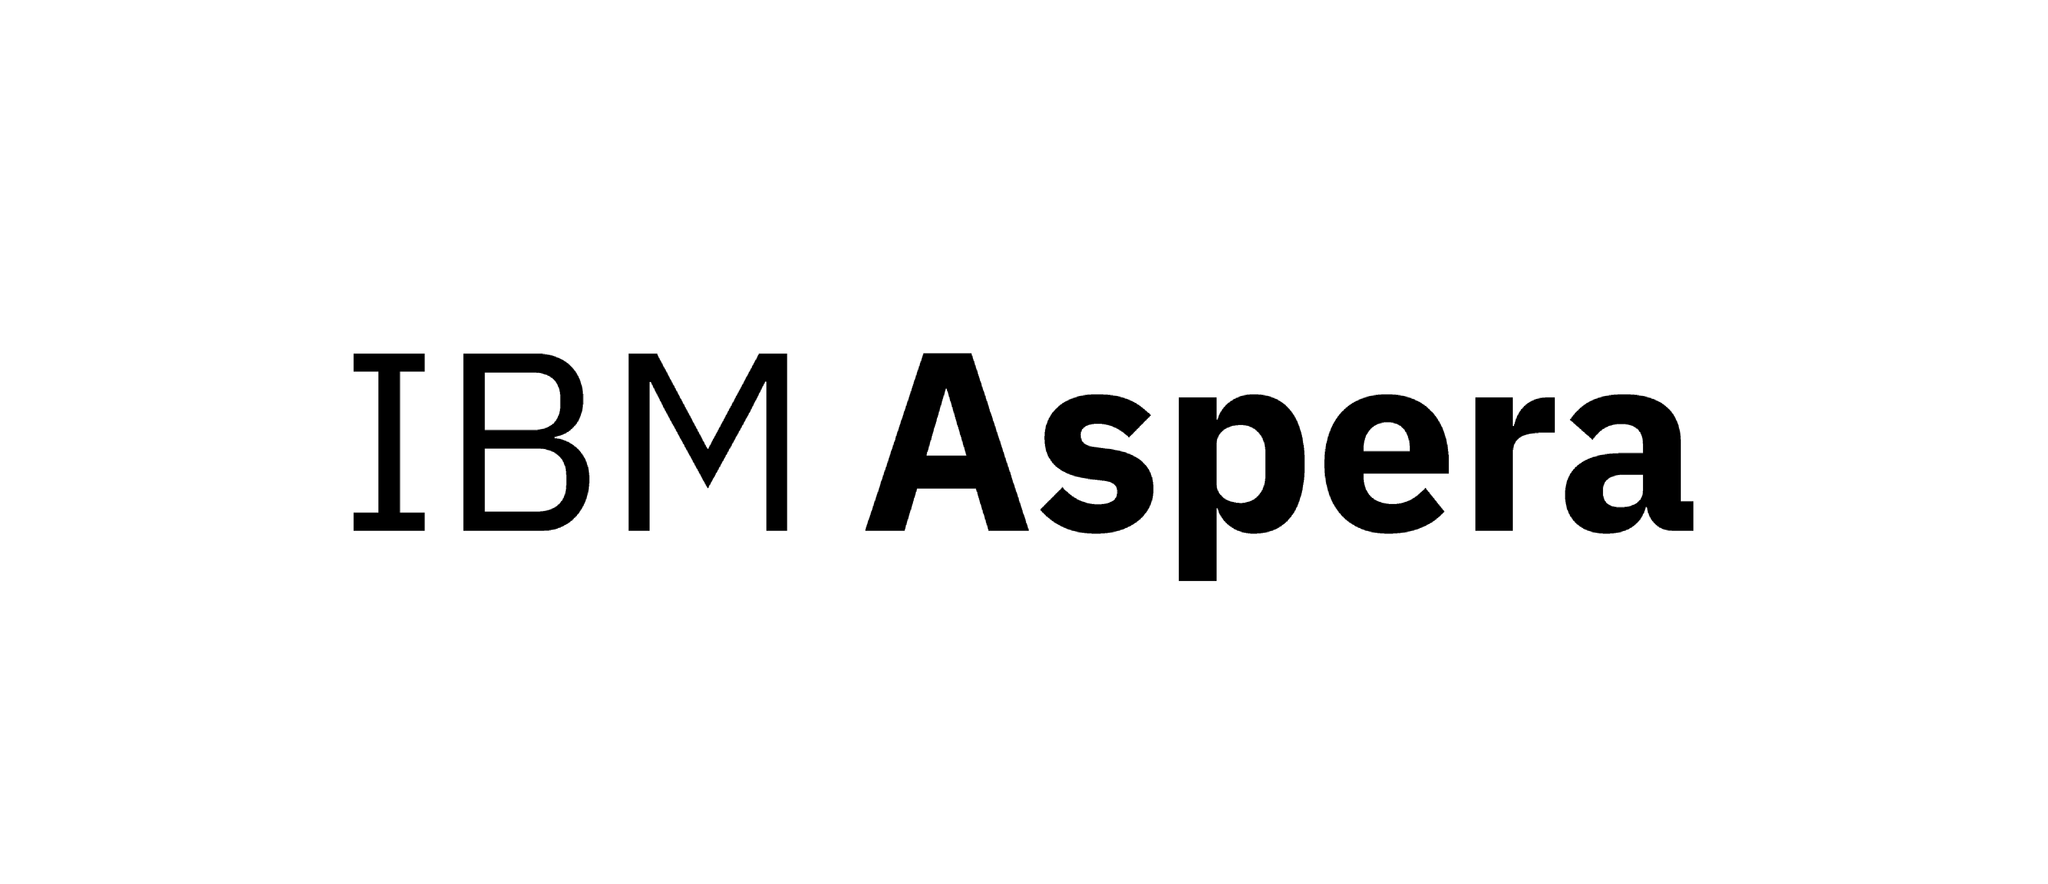 IBM Aspera